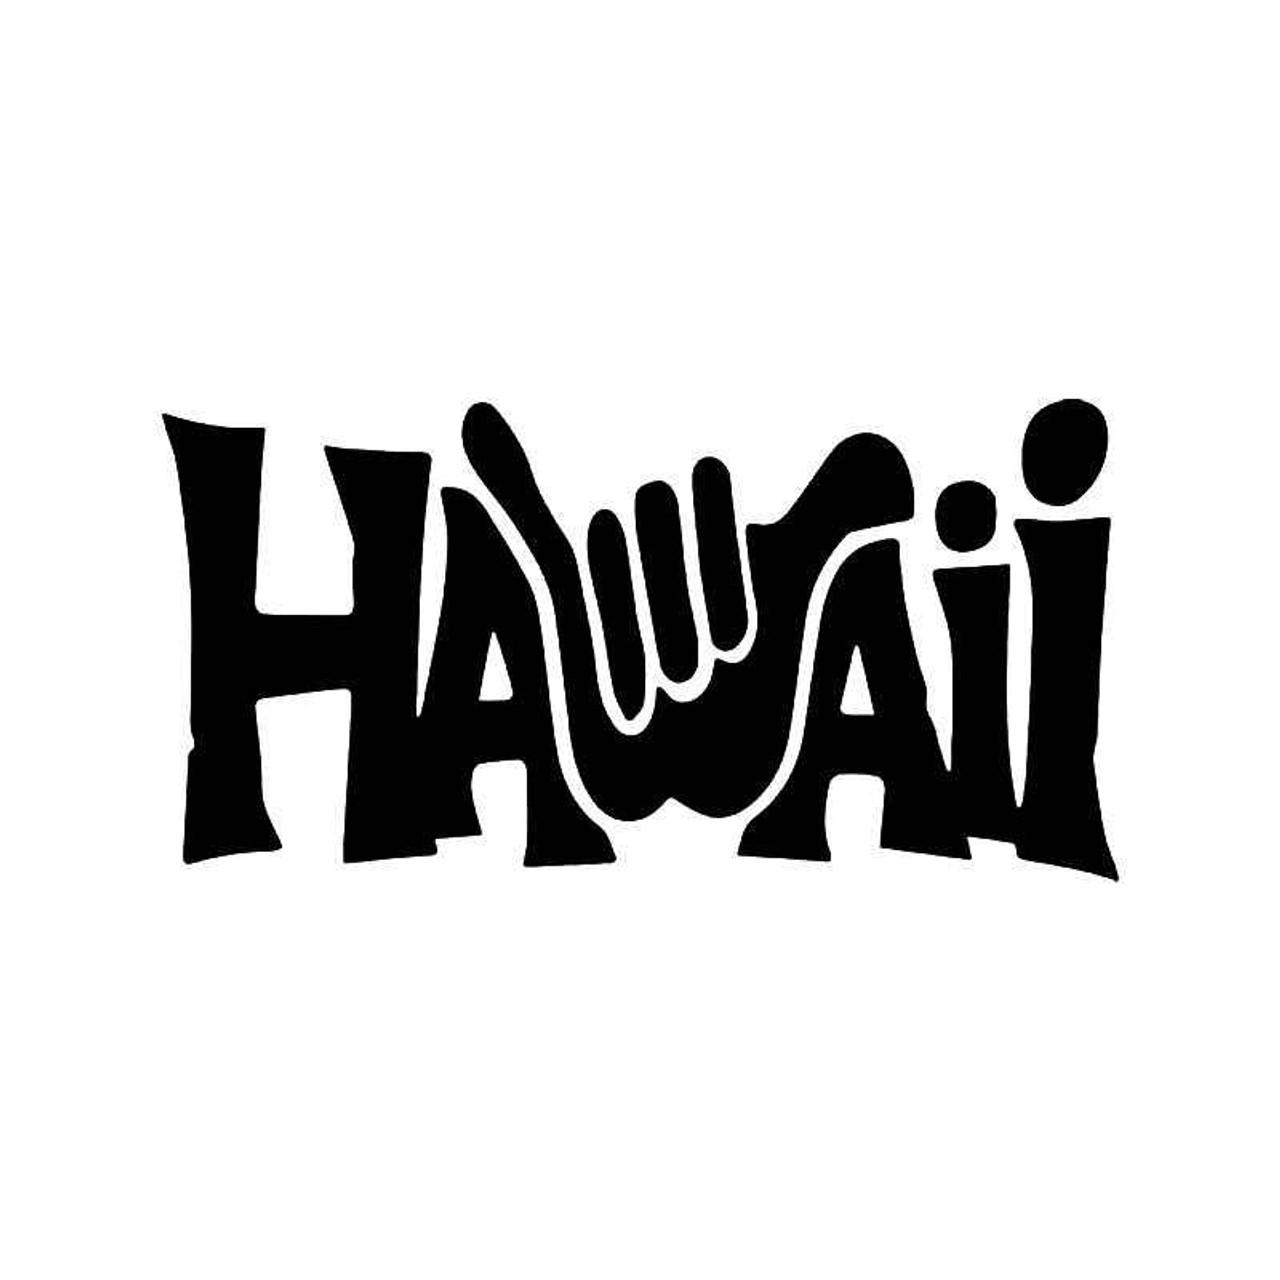 Shaka Hand Hawaii Vinyl Sticker